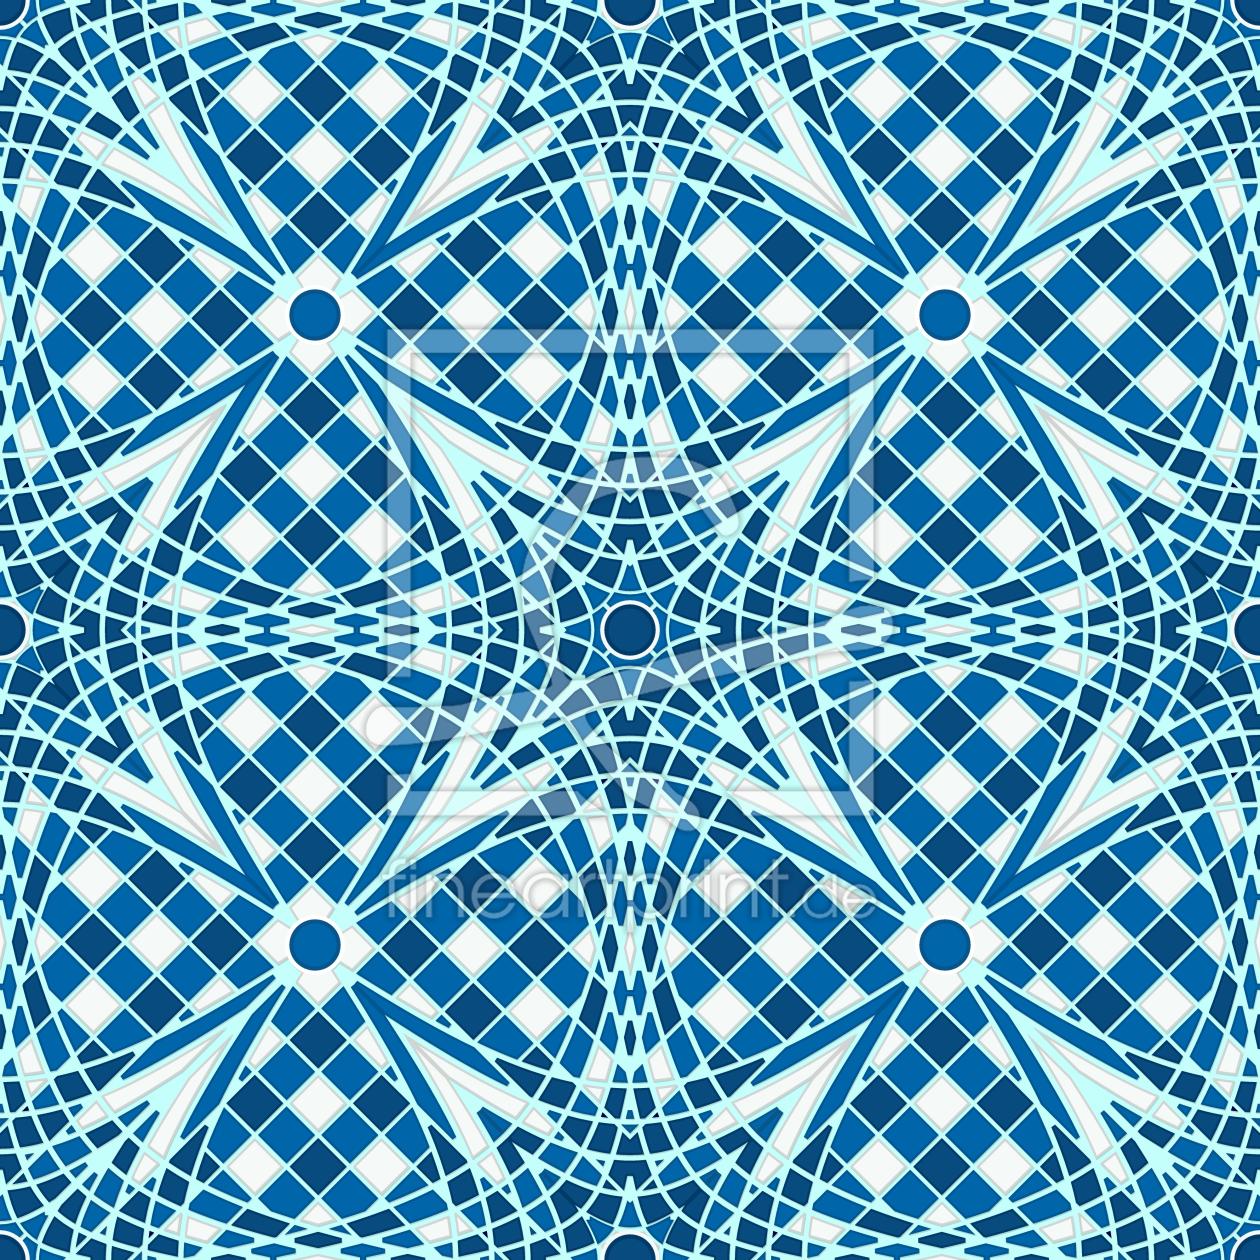 stern mosaik als tapete von patterndesigns com erh ltli. Black Bedroom Furniture Sets. Home Design Ideas